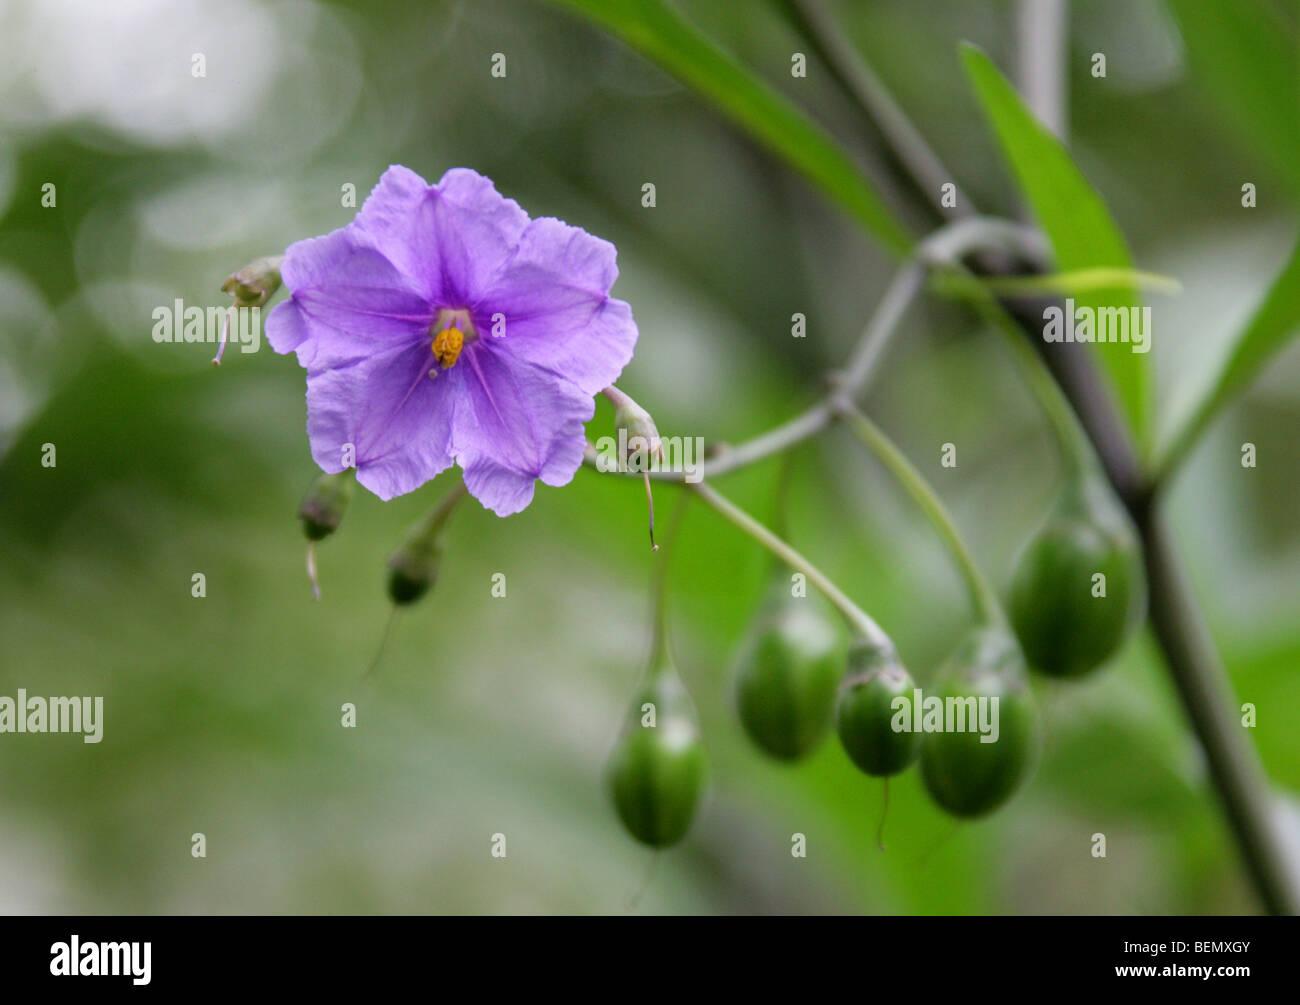 Fleur Et Fruits Veneneux Du Kangourou Apple Poroporo Ou Bullibulli